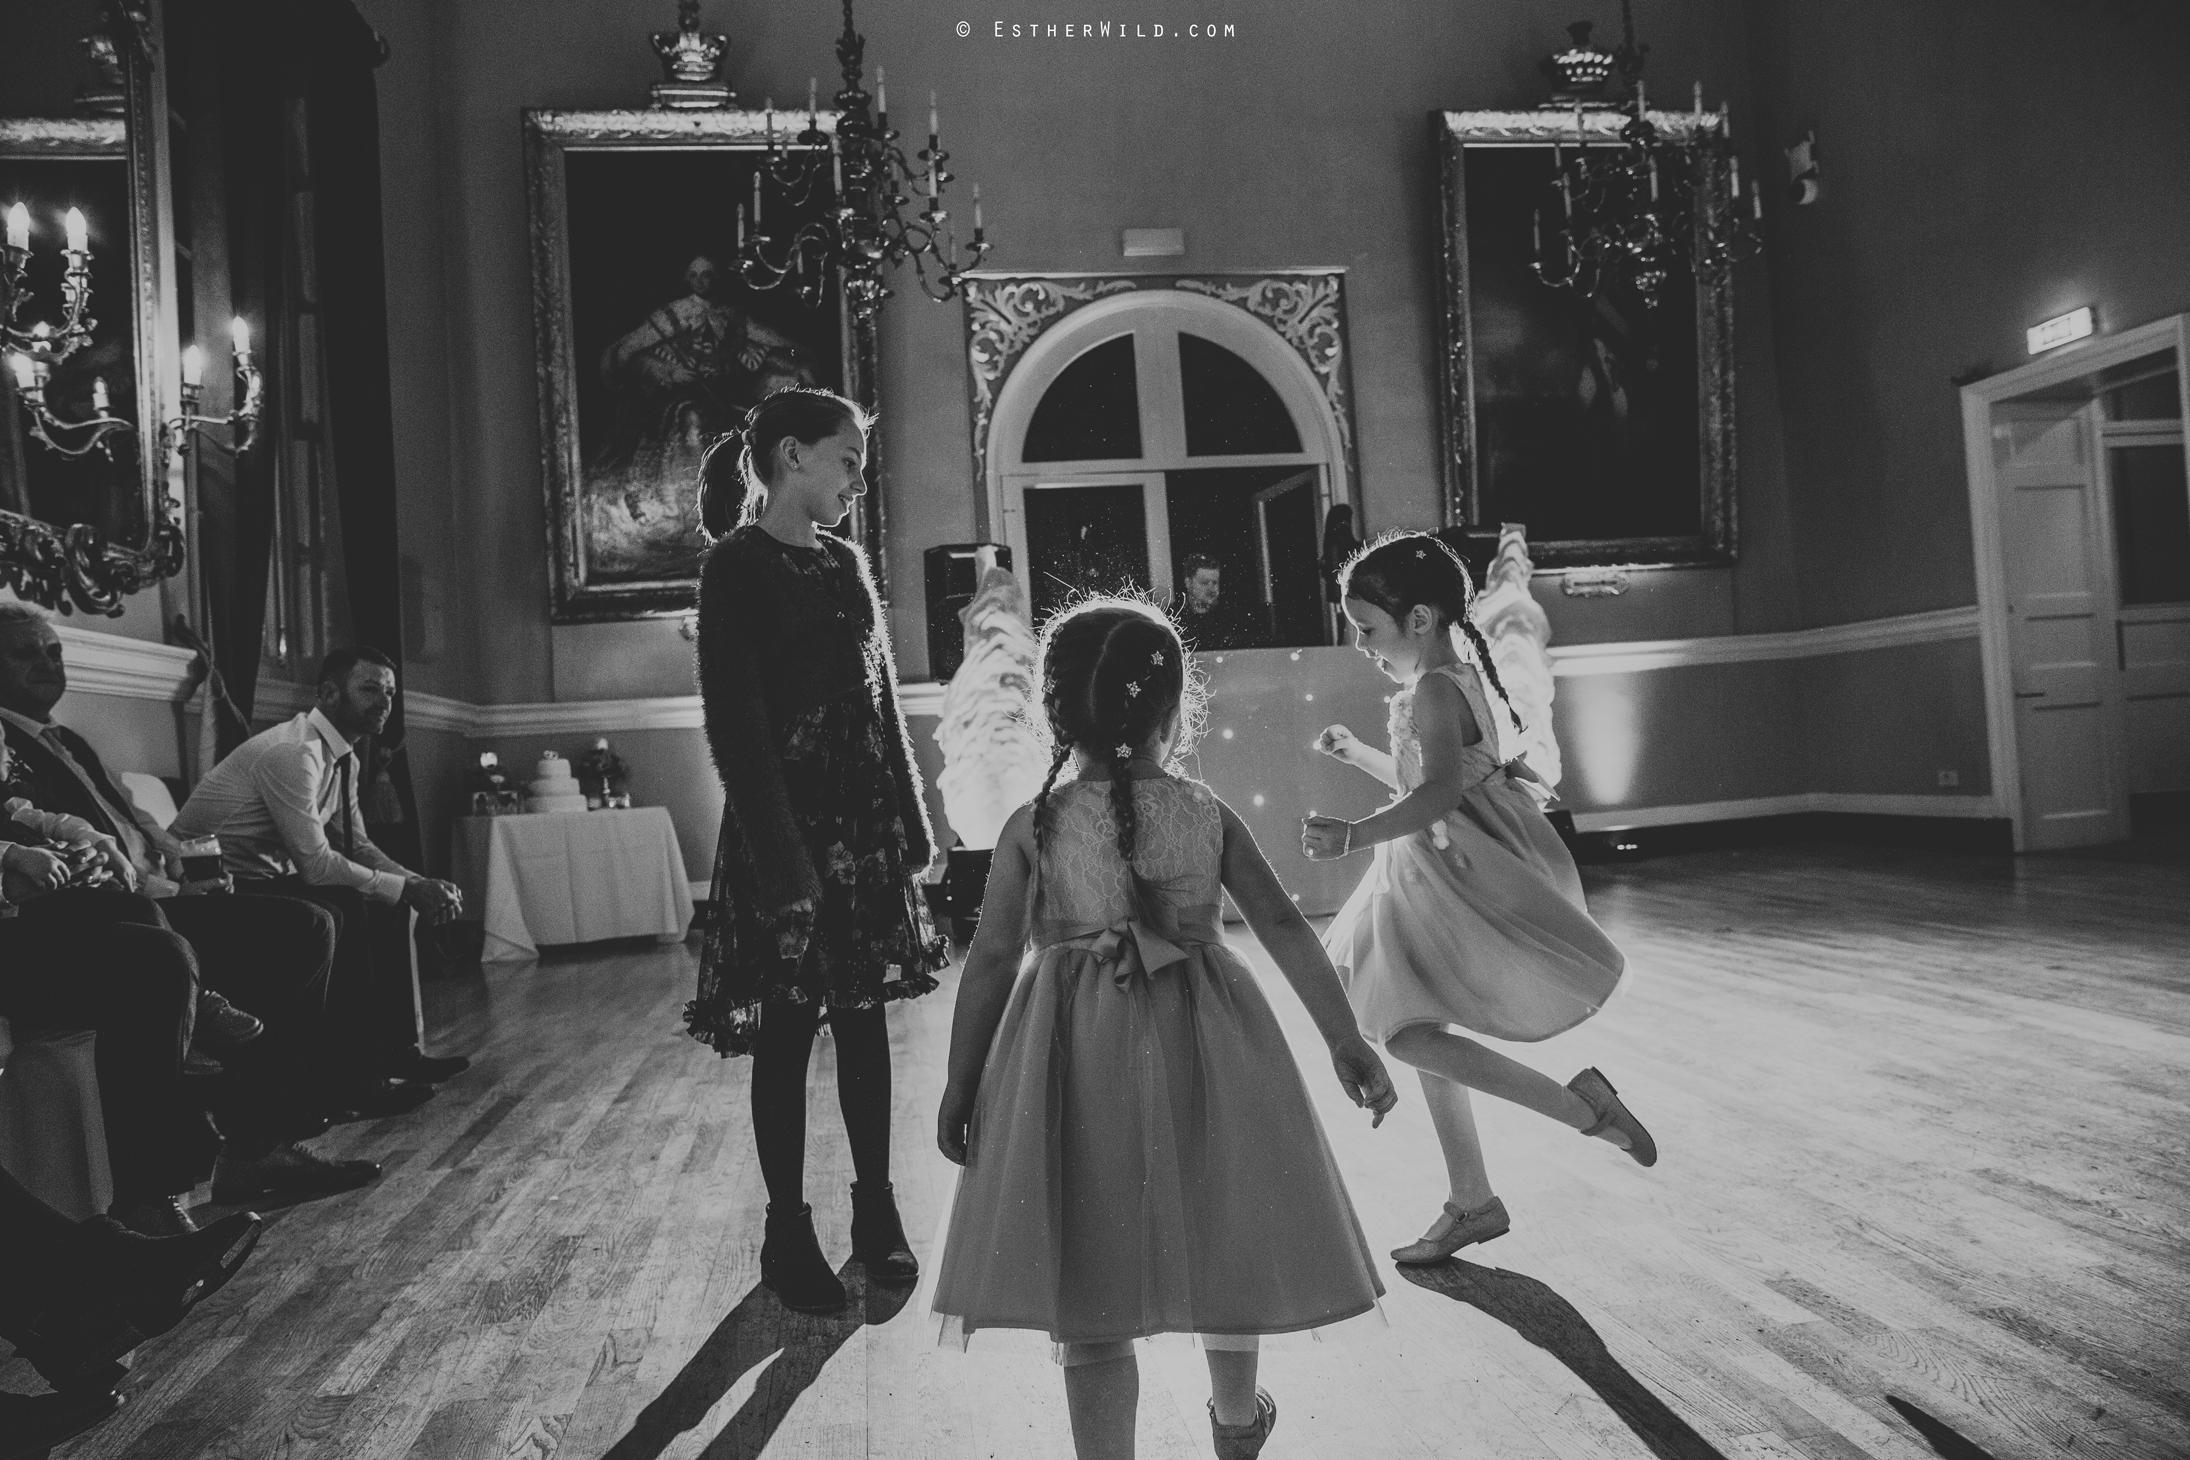 Wedding_Kings_Lynn_Town_Hall_Norfolk_Photographer_Esther_Wild_IMG_1823_IMGL0730.jpg